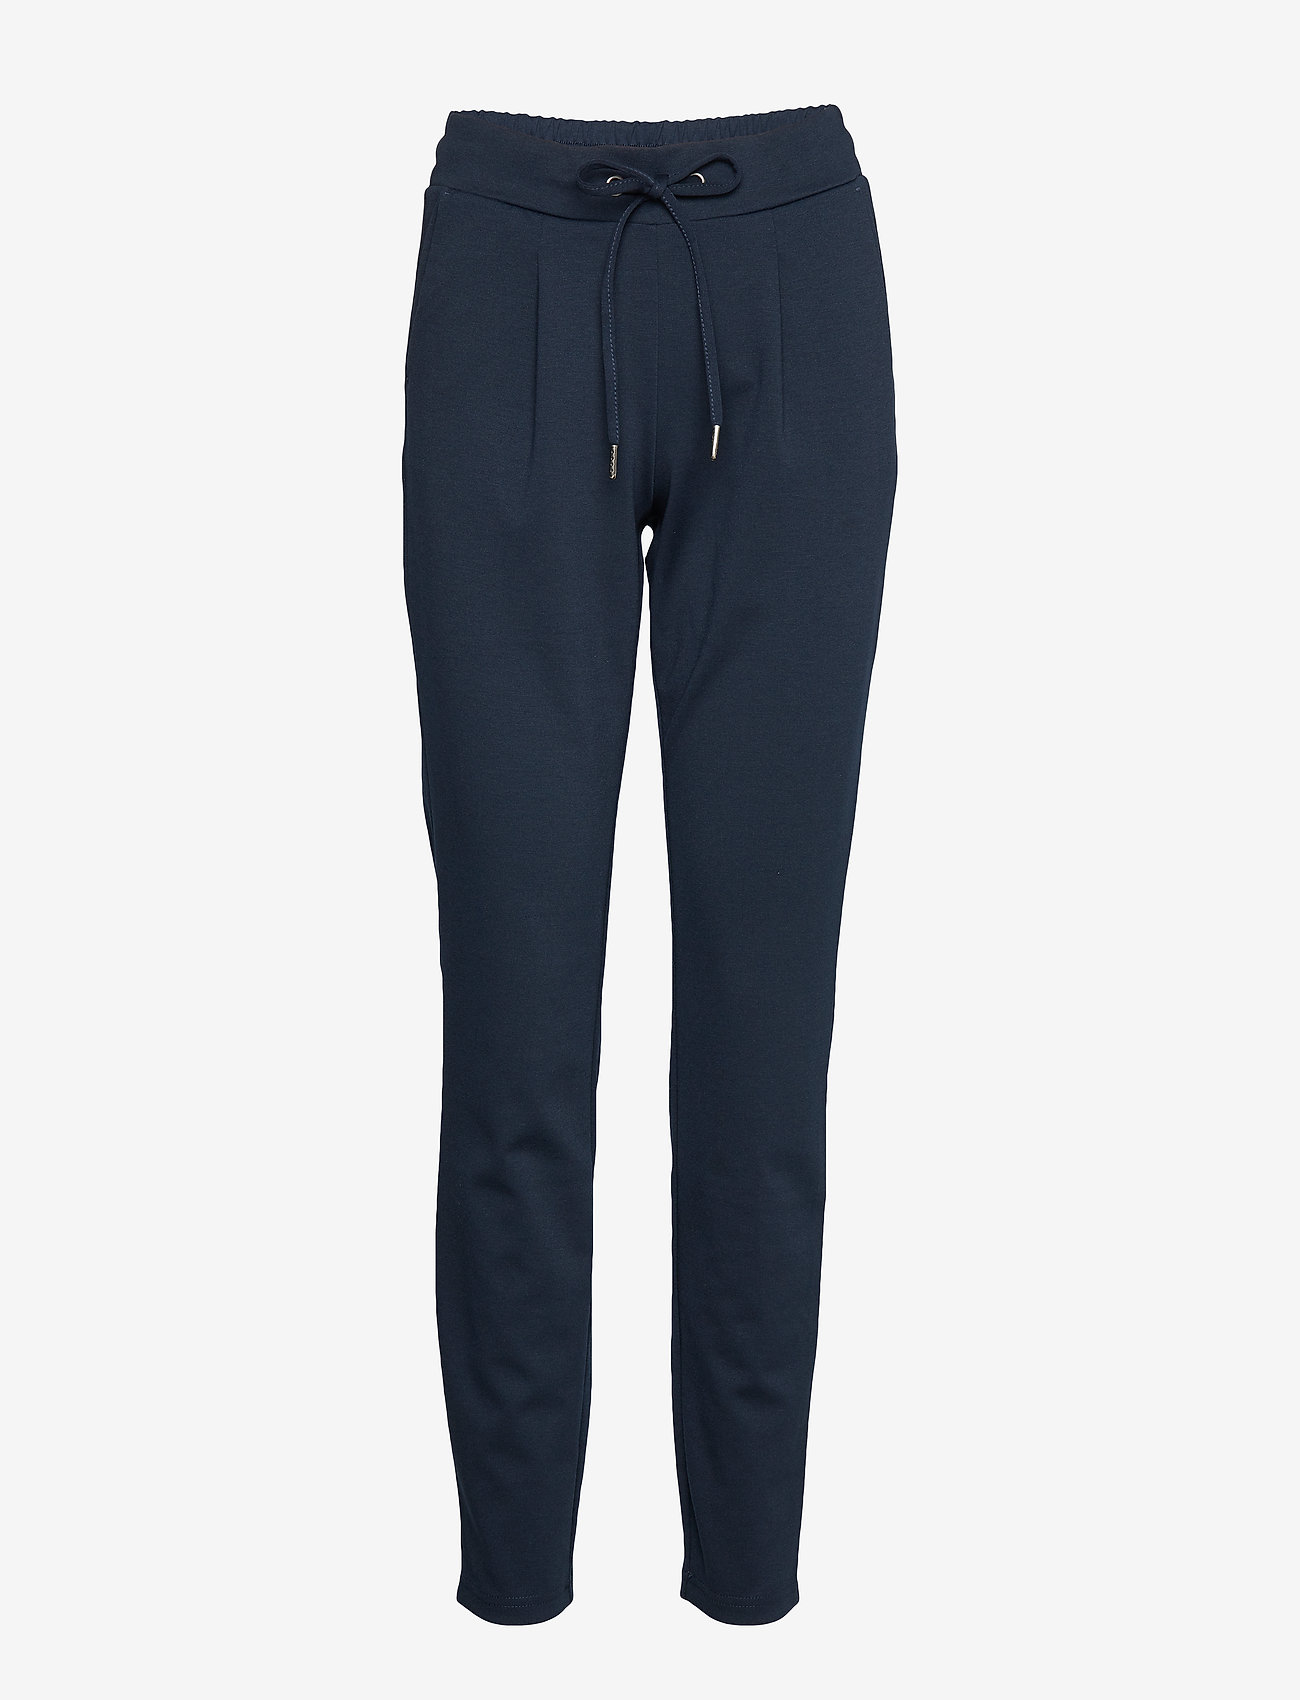 b.young - Rizetta pants 2 - Jersey - slim fit bukser - copenhagen night - 0